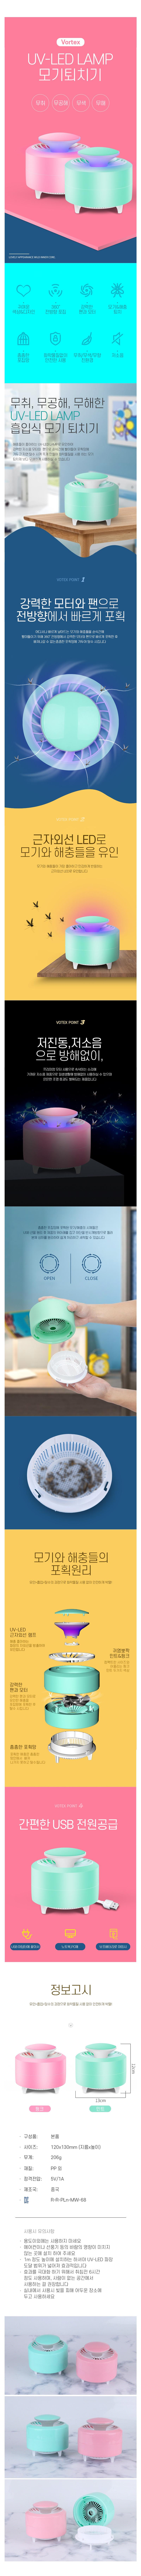 Vortex mini 광촉매 UV-LED USB 해충 모기퇴치기 포충기 - 디자인에버, 14,800원, 여름용품, 모기퇴치용품